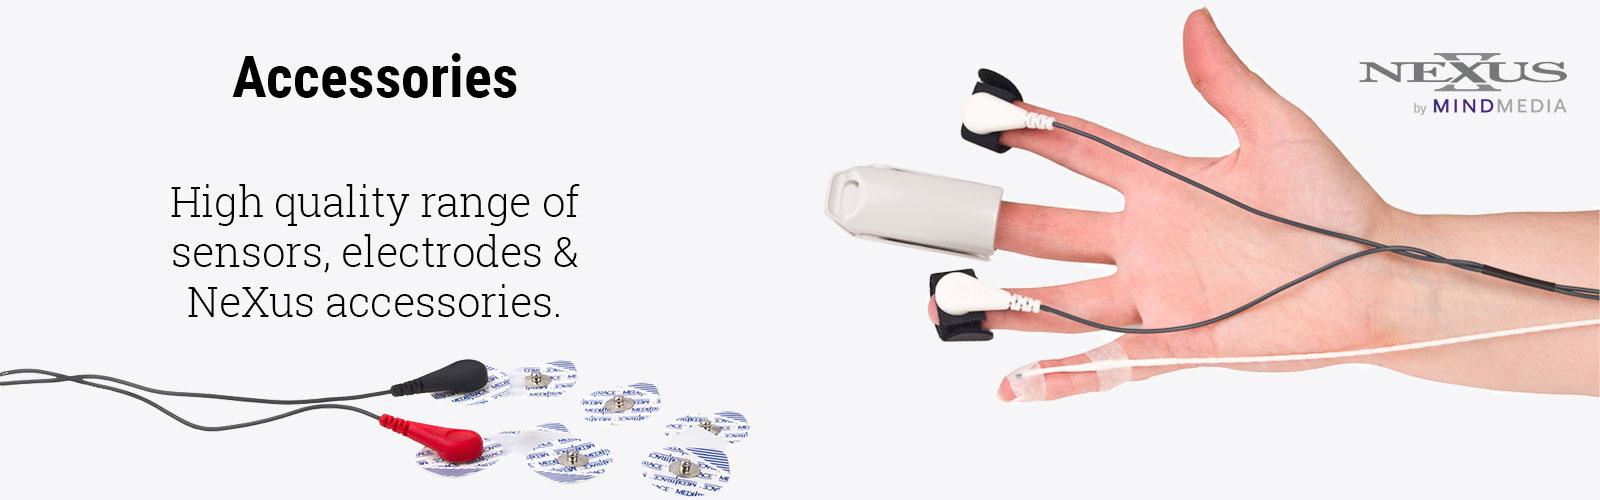 Nexus-accessories-biofeedback-neurofeedback